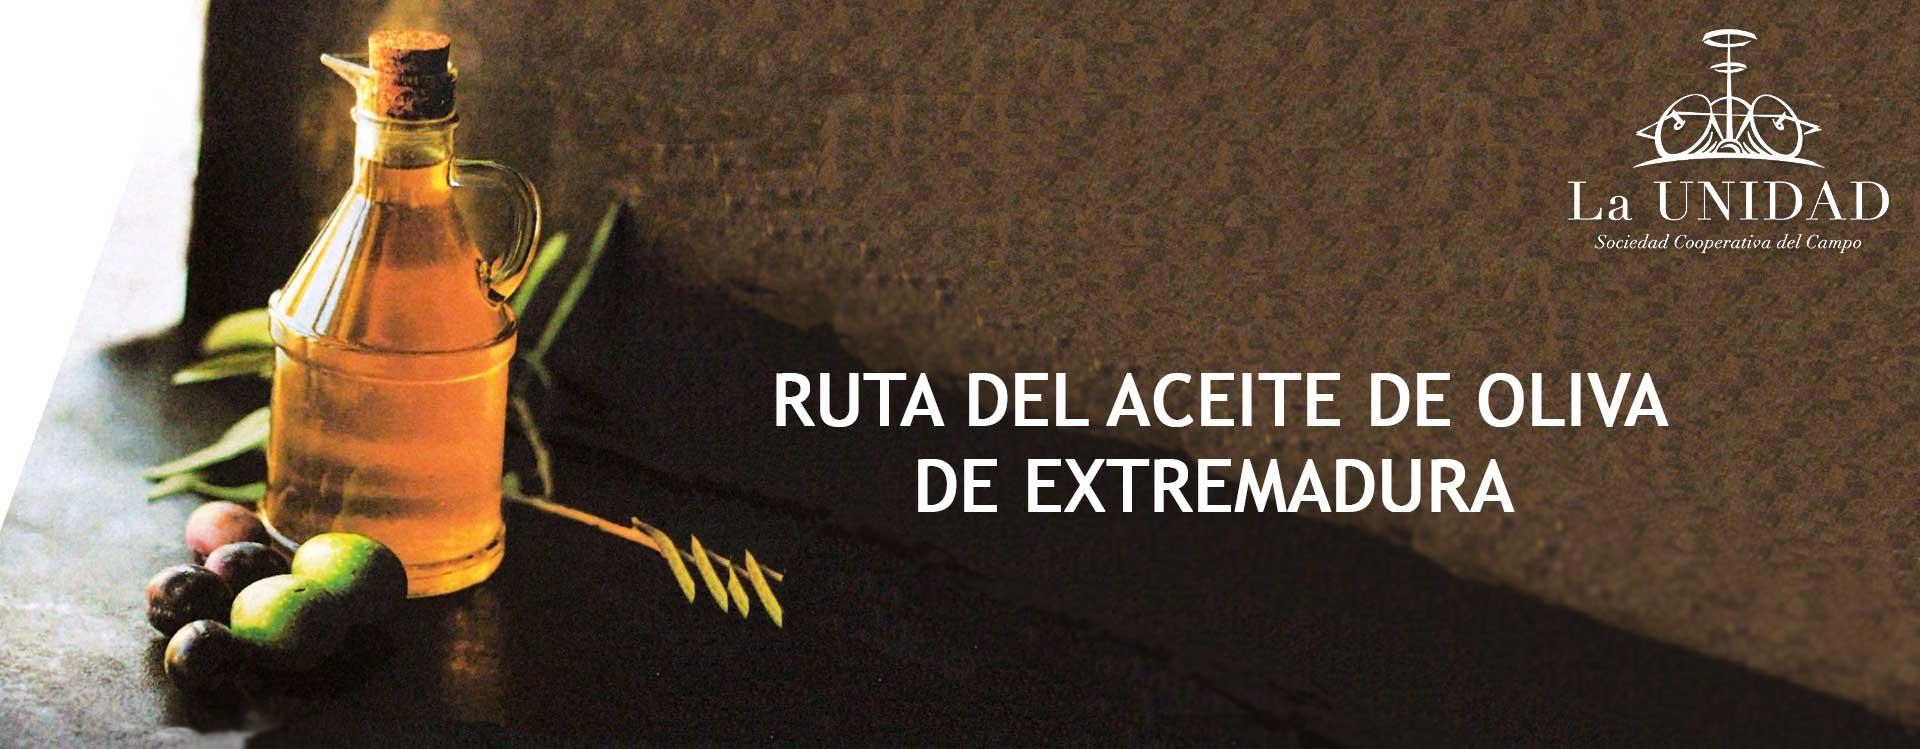 Ruta del Aceite de Oliva De Extremadura